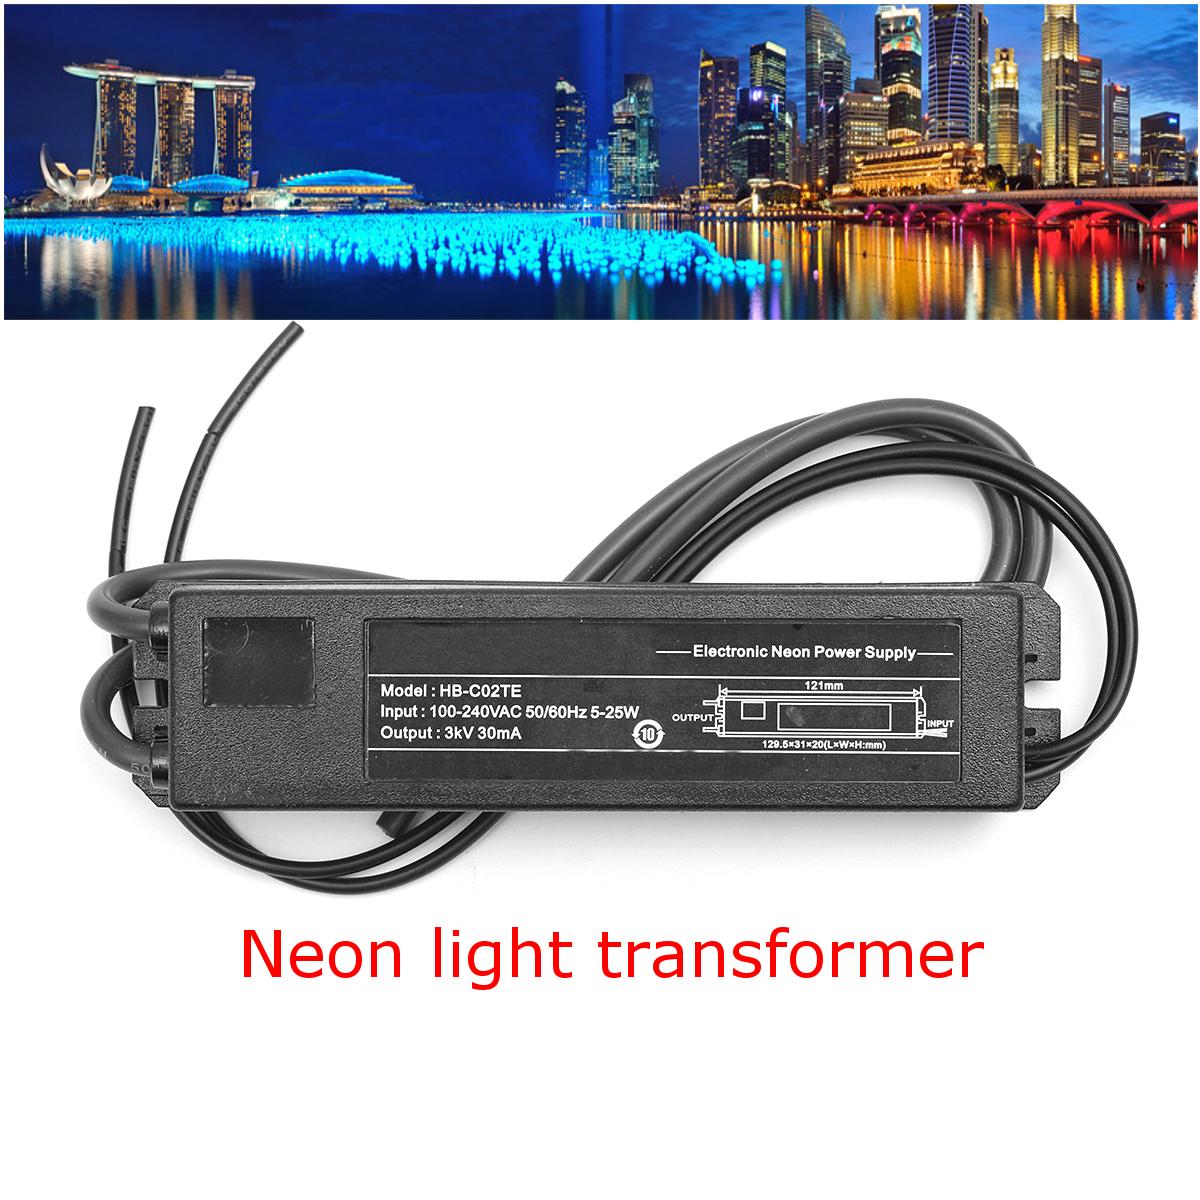 Universal HB-C02TE 3KV 30MA 5-25W Glass Neon Sign Light Power Supply Transformer Adapter Driver